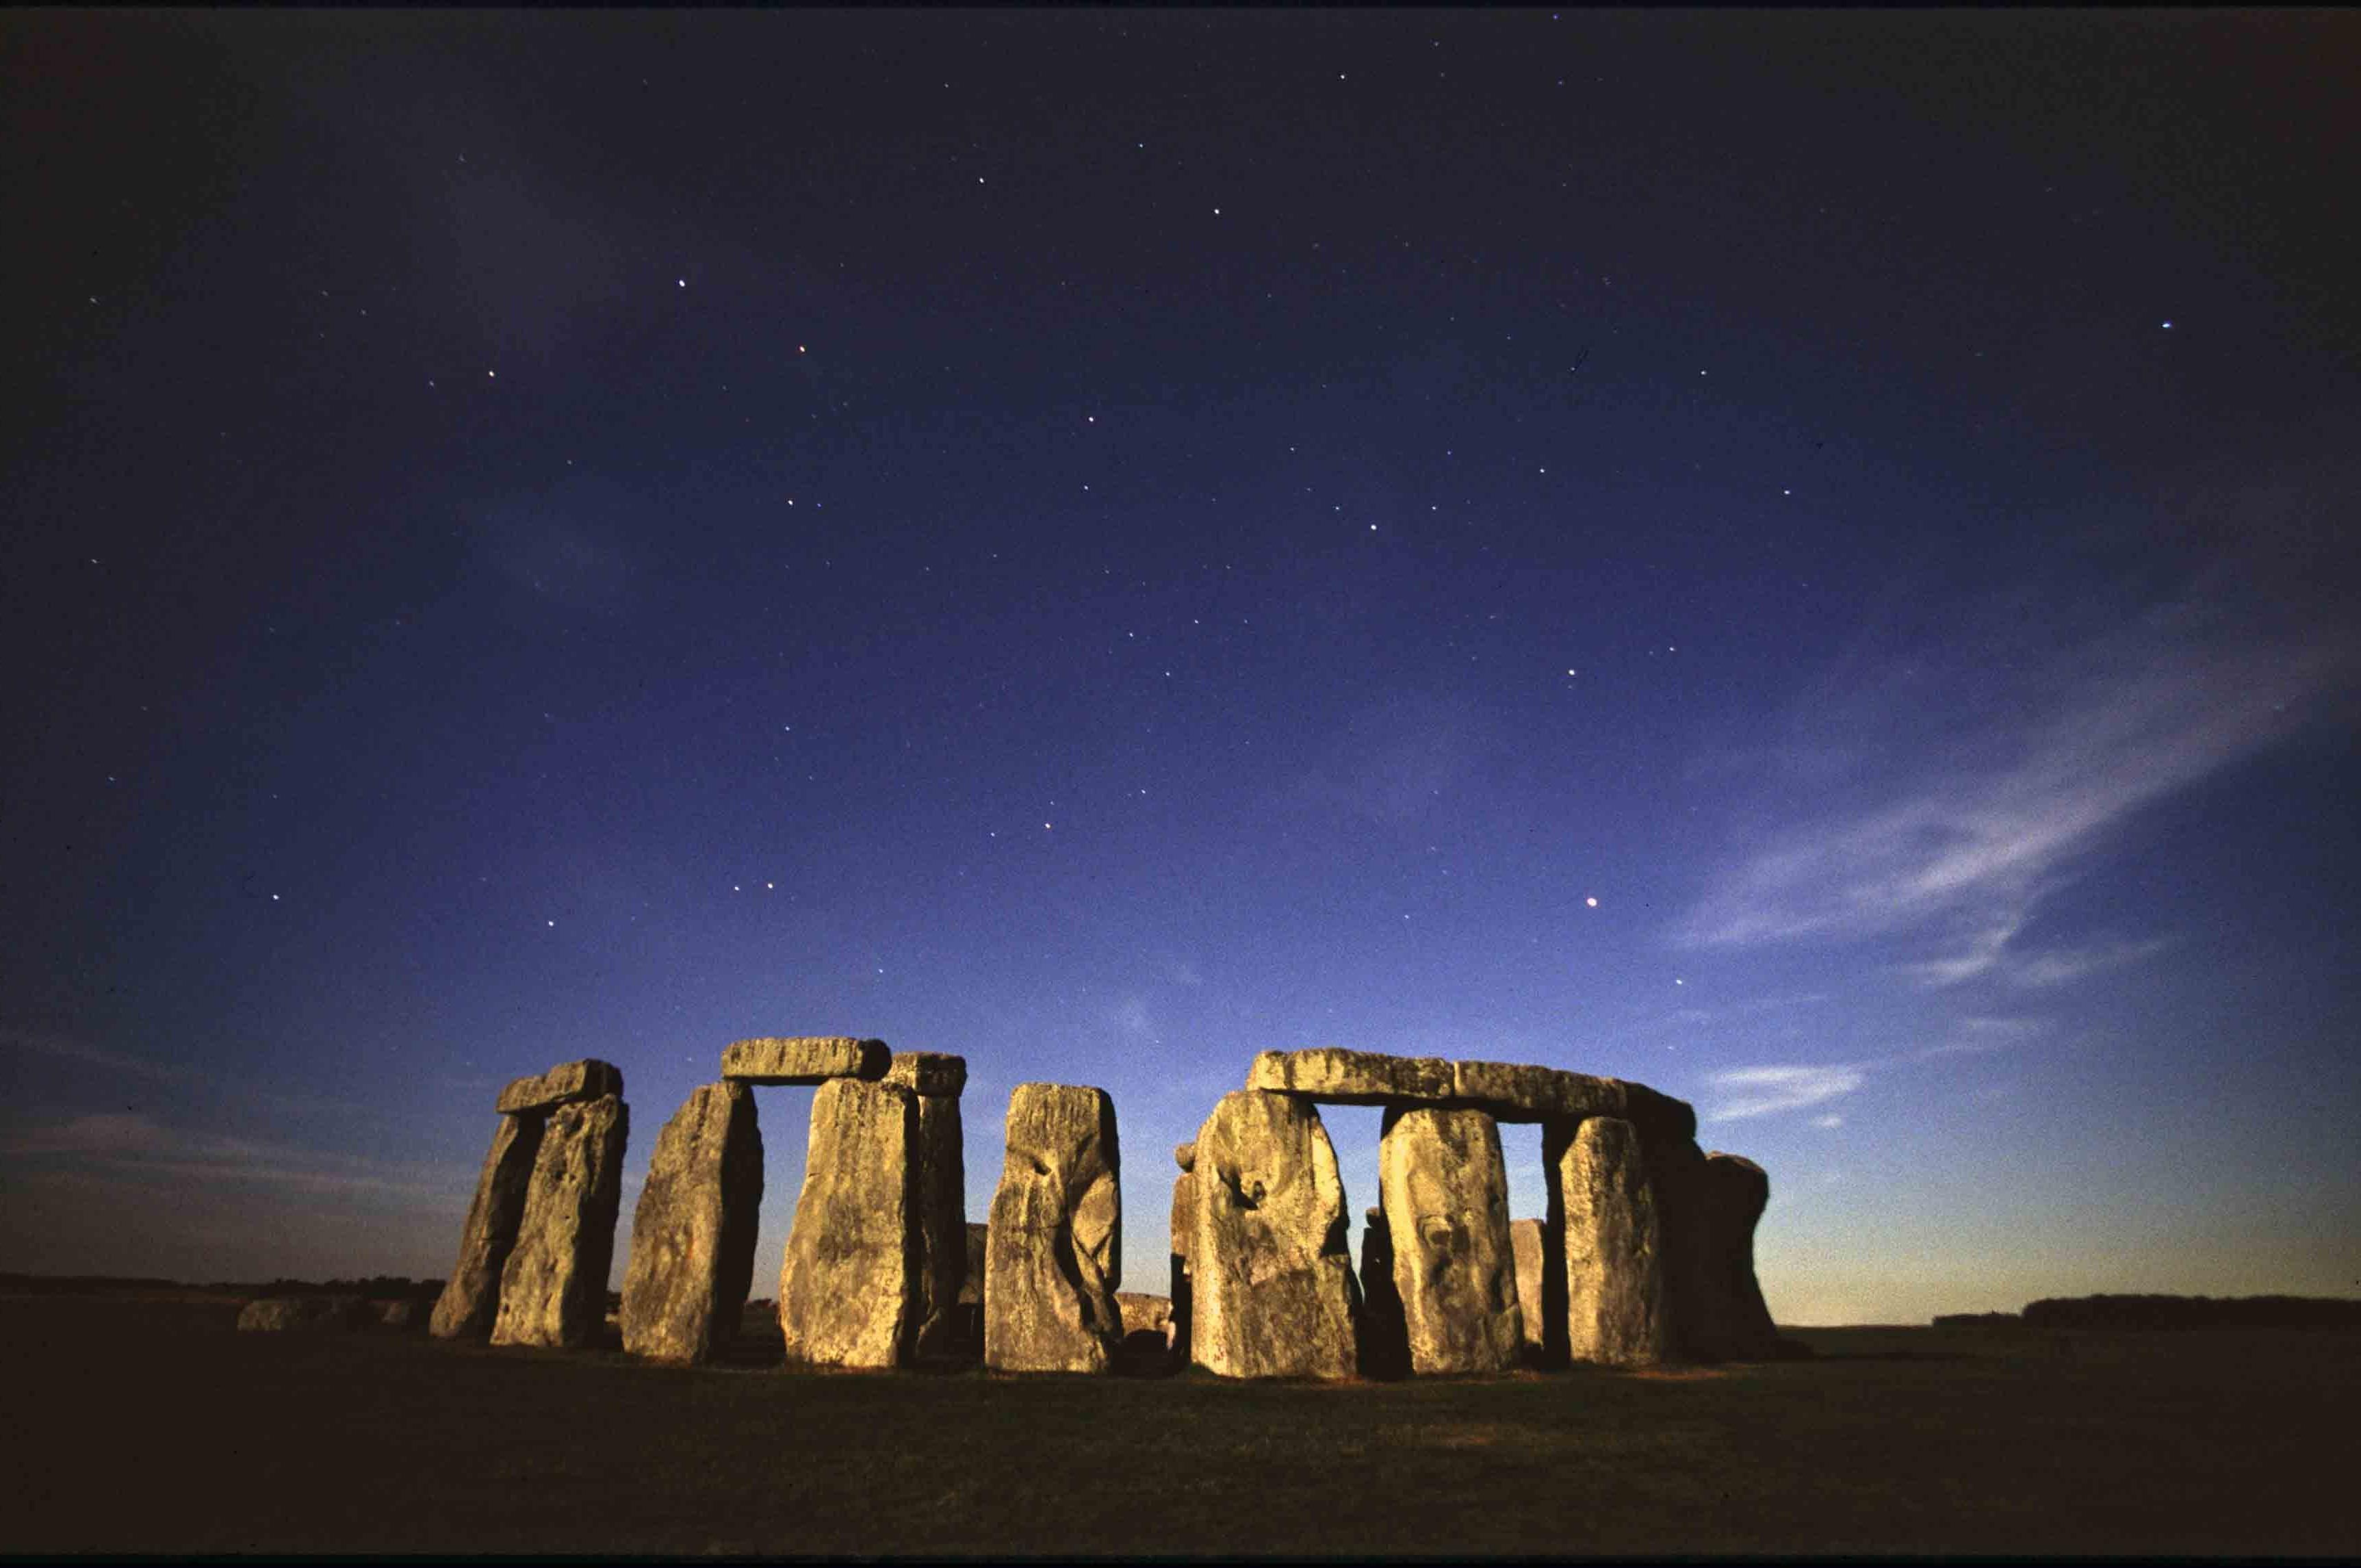 stonehenge moonlight - HD3450×2291